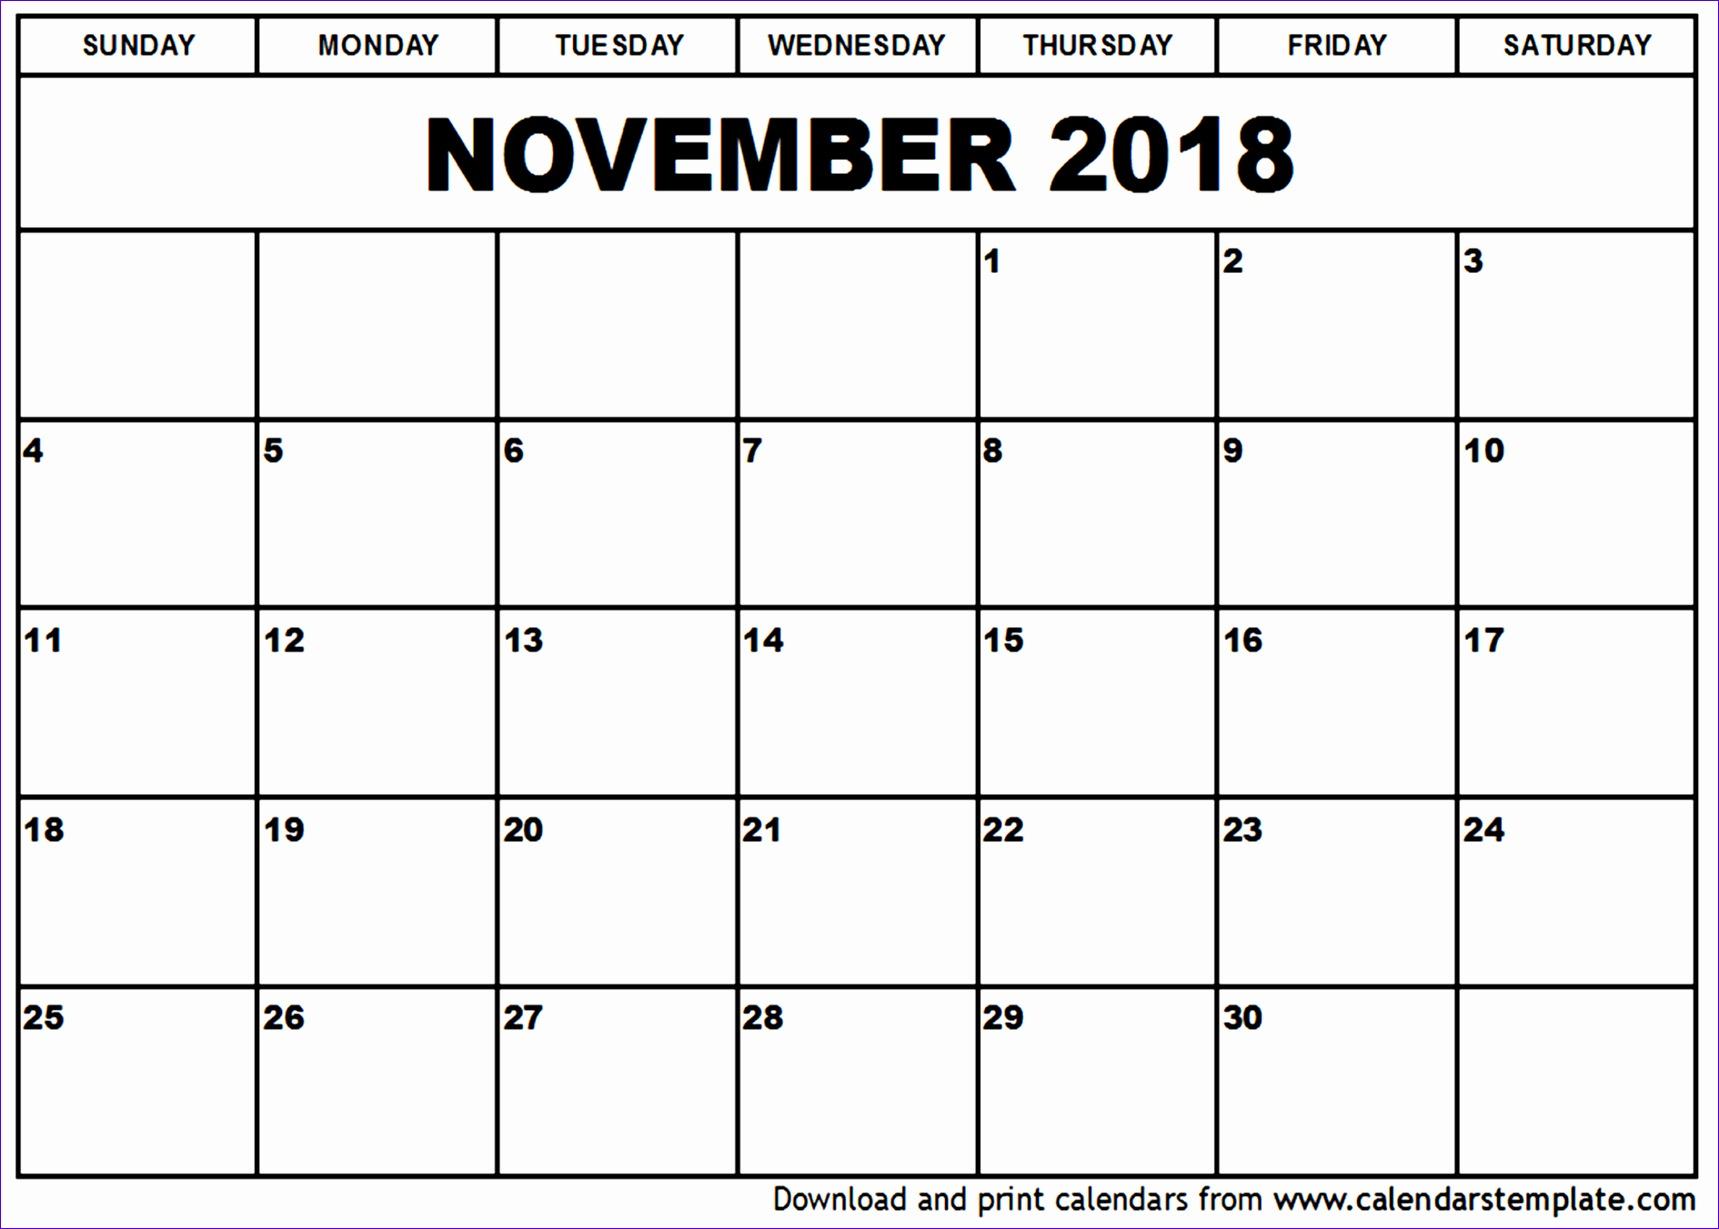 november 2018 calendar template 1195 17191229